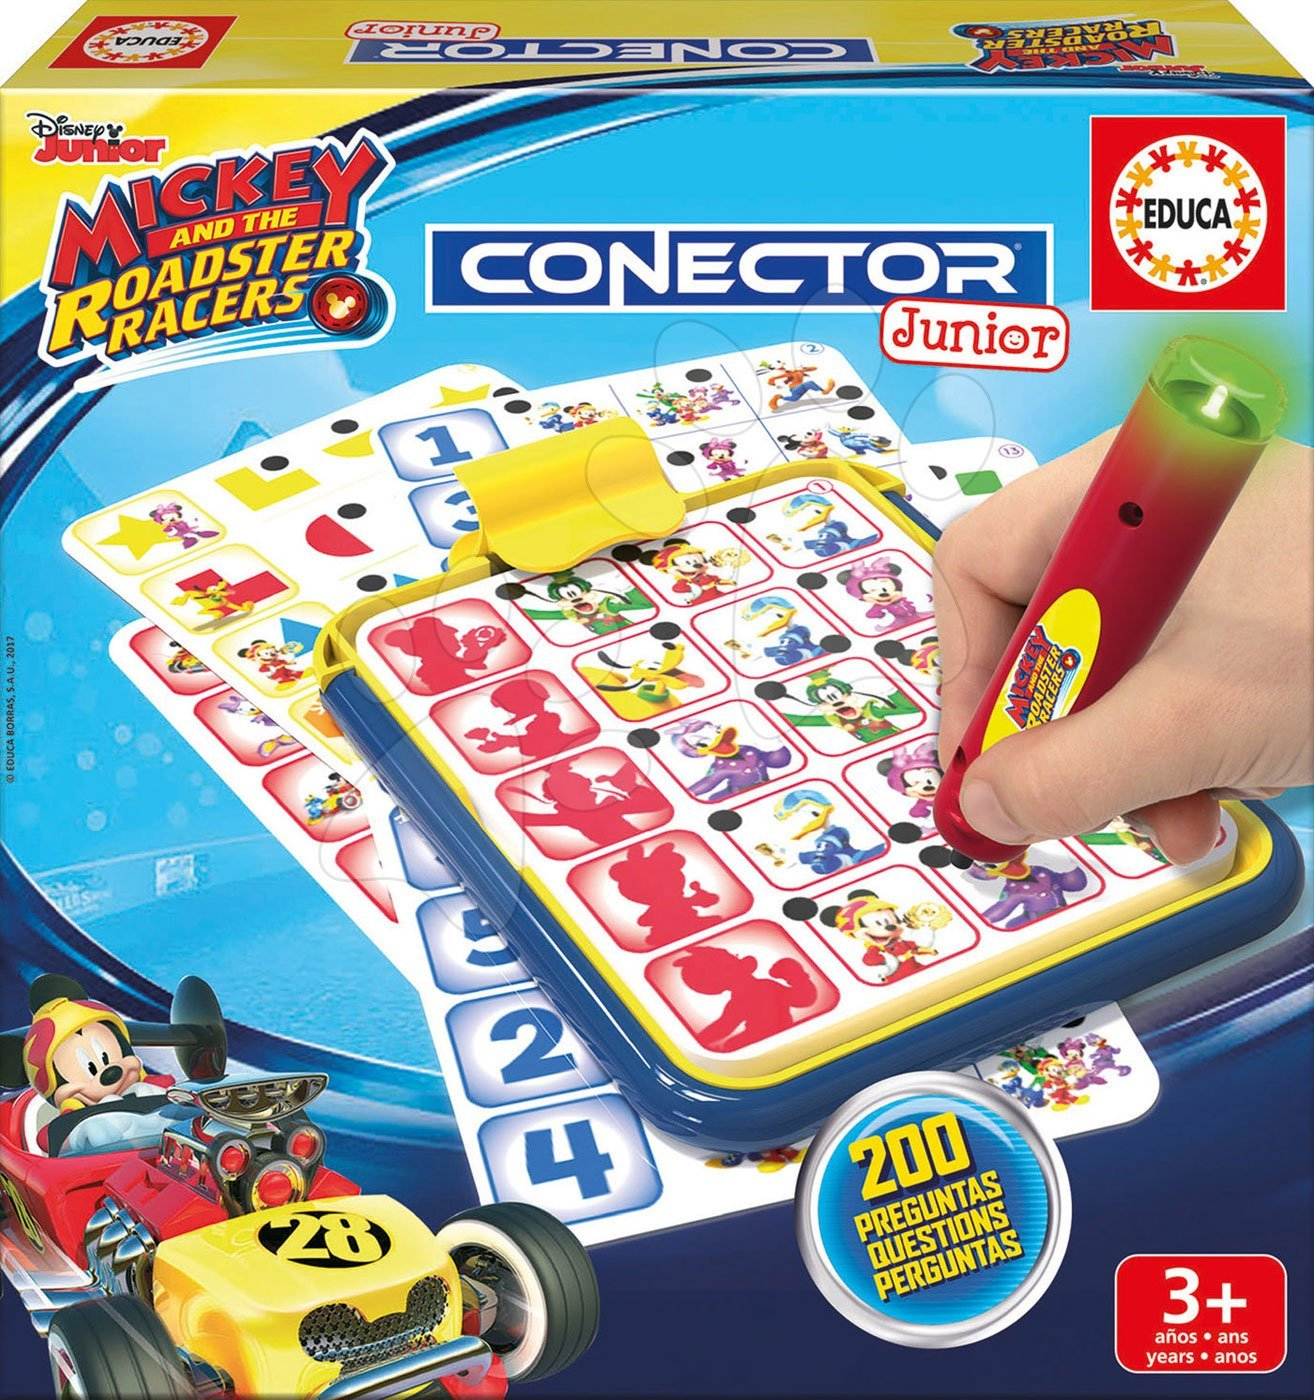 Společenská hra Mickey and the roadster racers Conector junior Educa 40 karet a 200 otázek a inteligentní pero